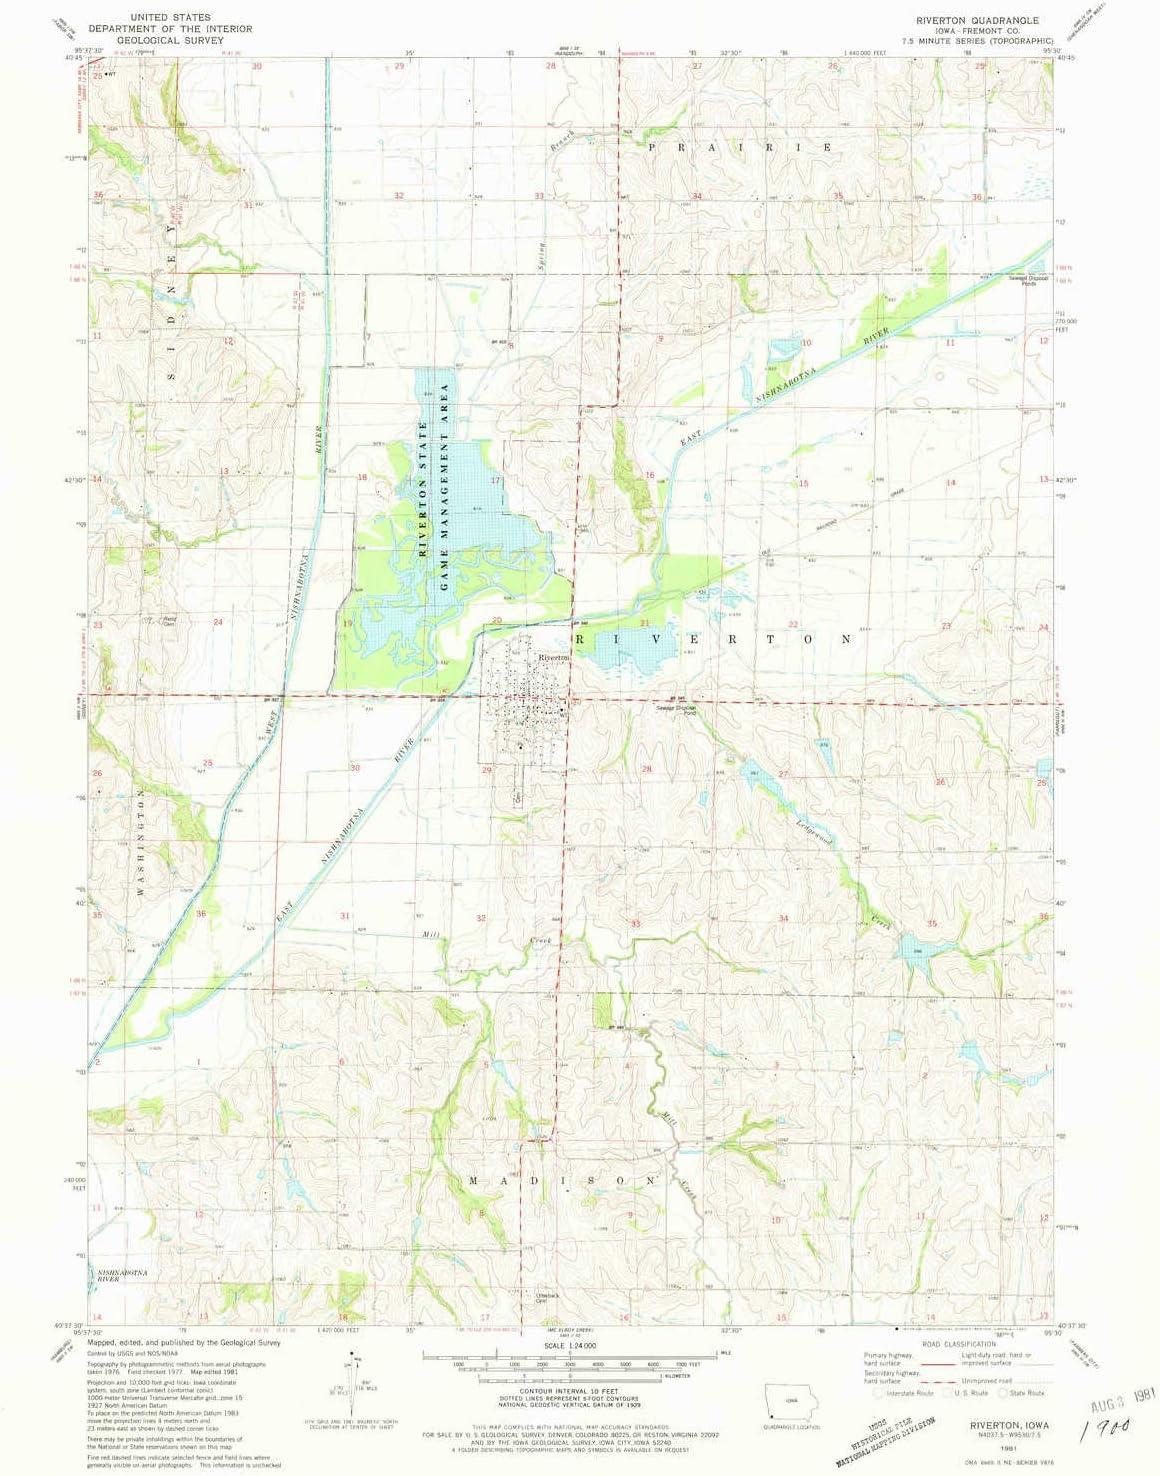 YellowMaps Riverton Detroit Mall IA topo map Scale X free Minute 1:24000 7.5